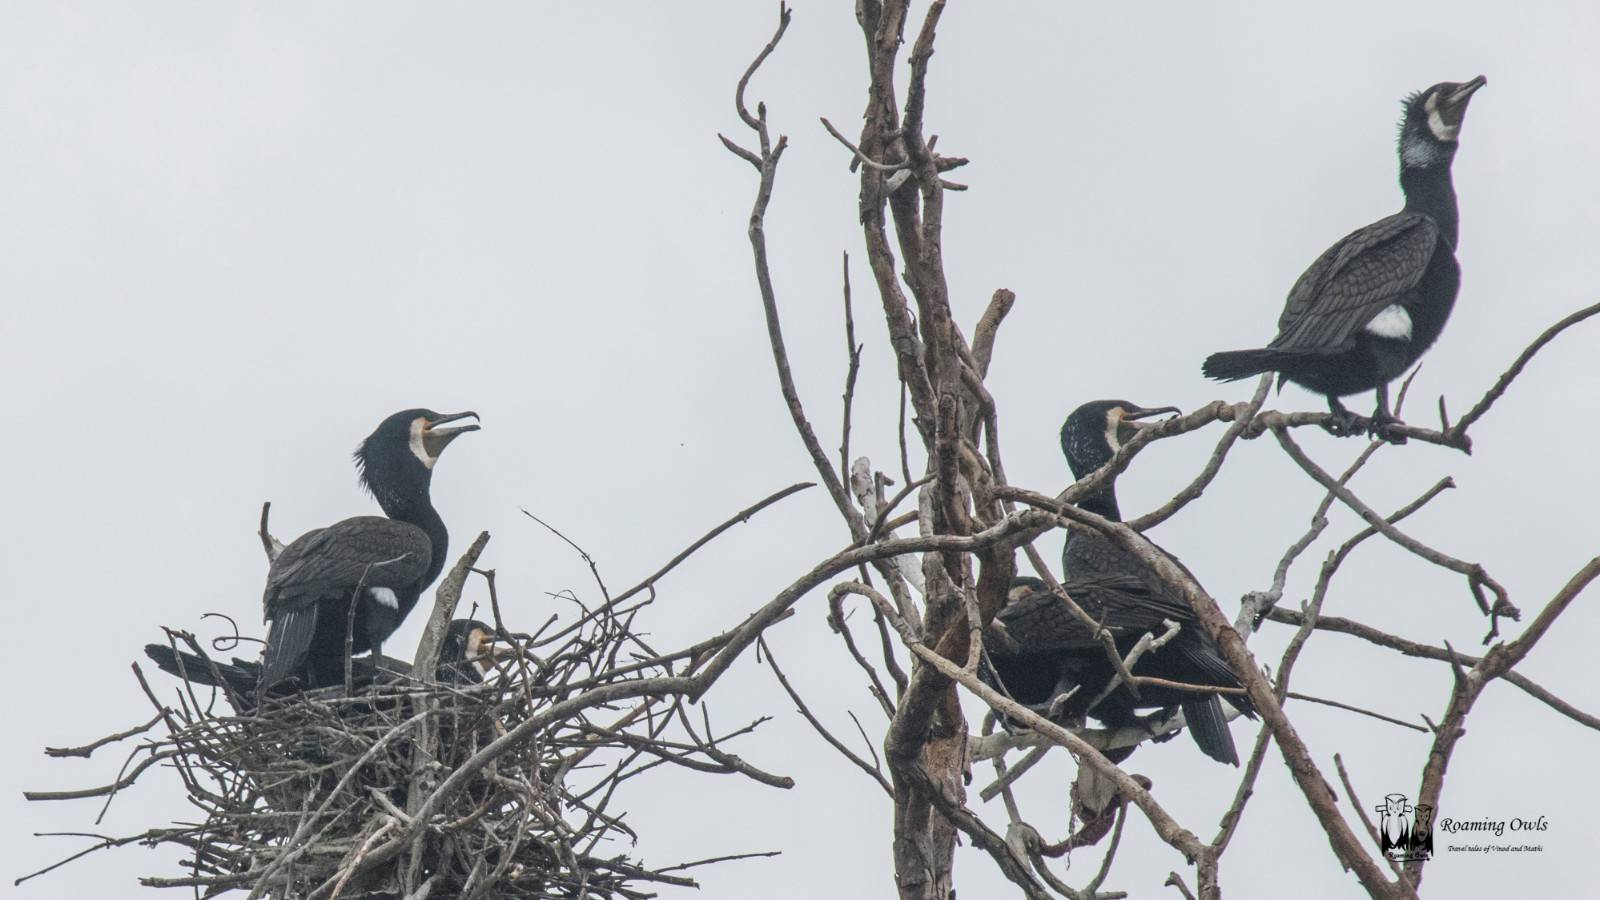 Phalacrocorax carbo,Great Cormorant,cormorant nesting